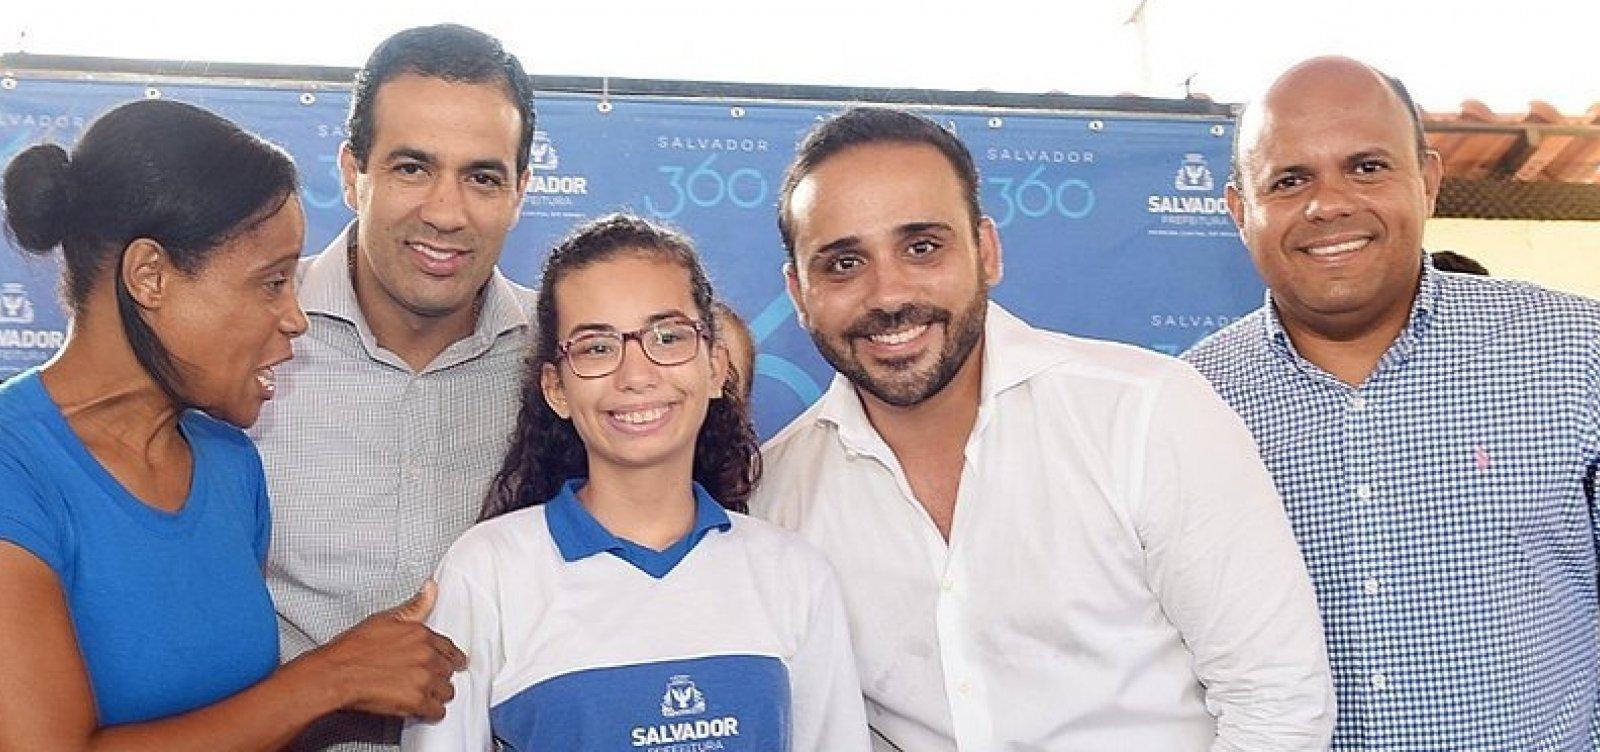 Salvador passa a ter 30 intérpretes para alunos com deficiência auditiva